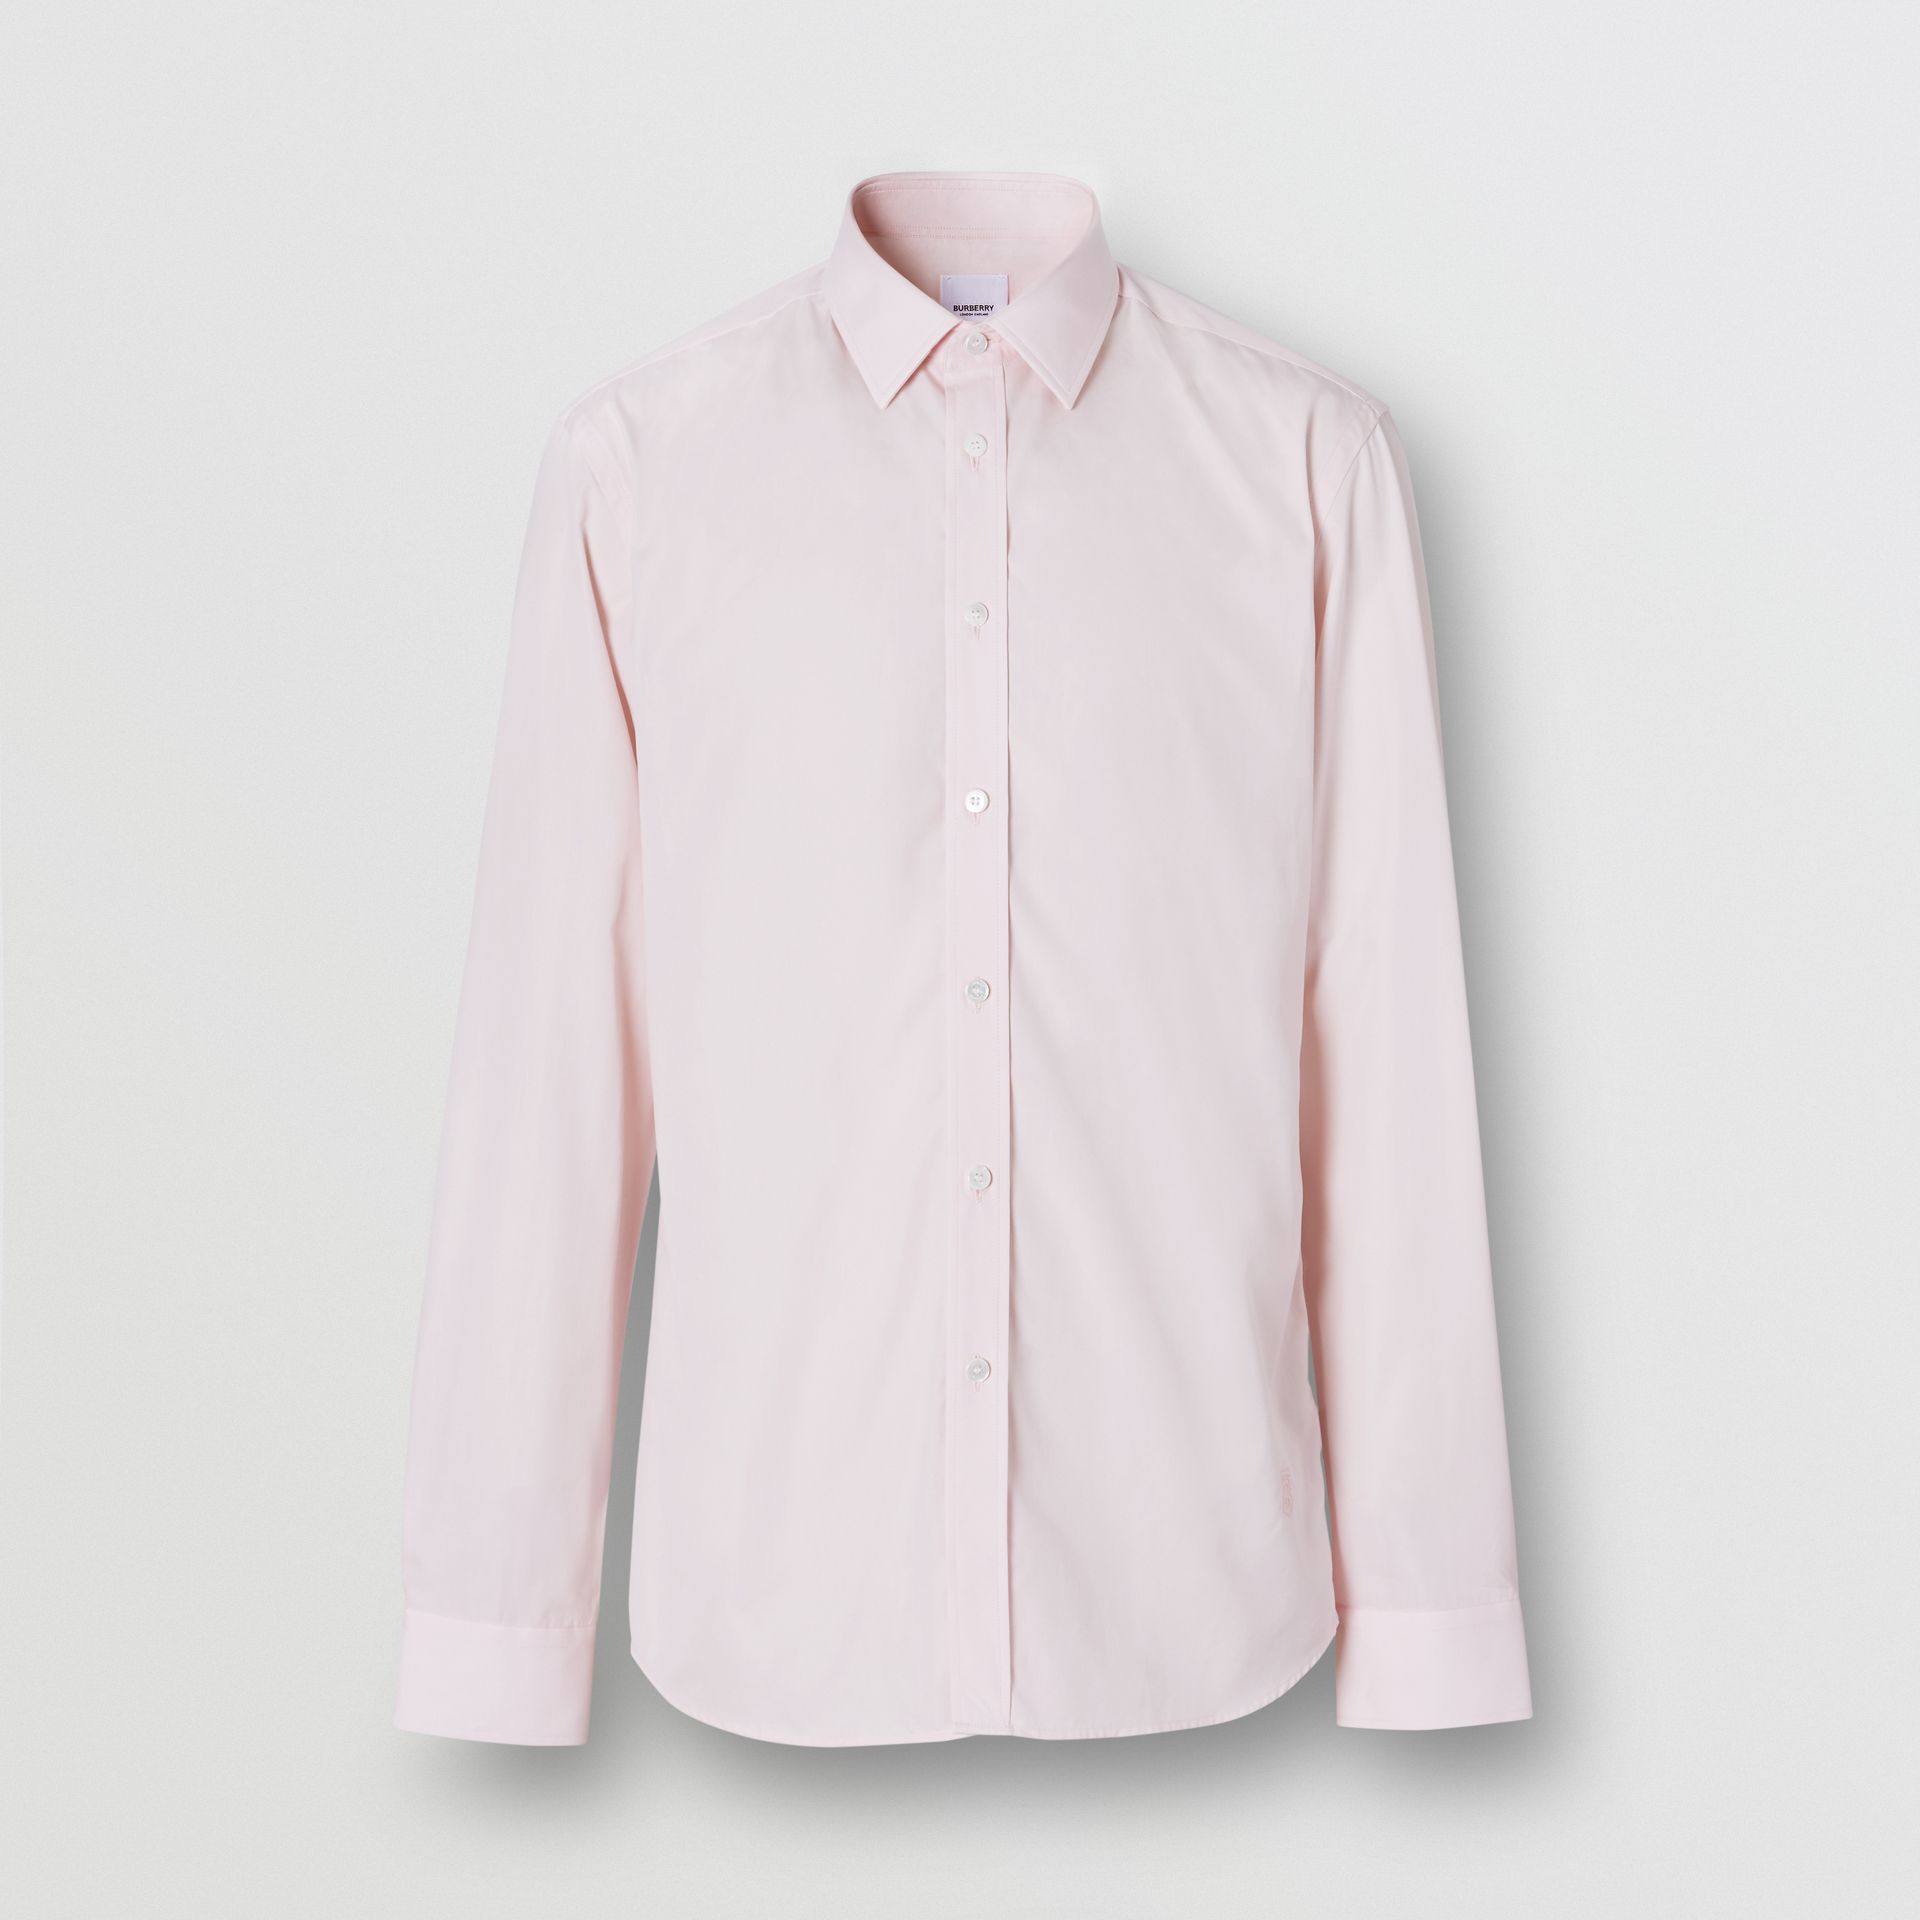 Slim Fit Monogram Motif Cotton Poplin Shirt in Alabaster Pink - Men | Burberry Hong Kong S.A.R - gallery image 3